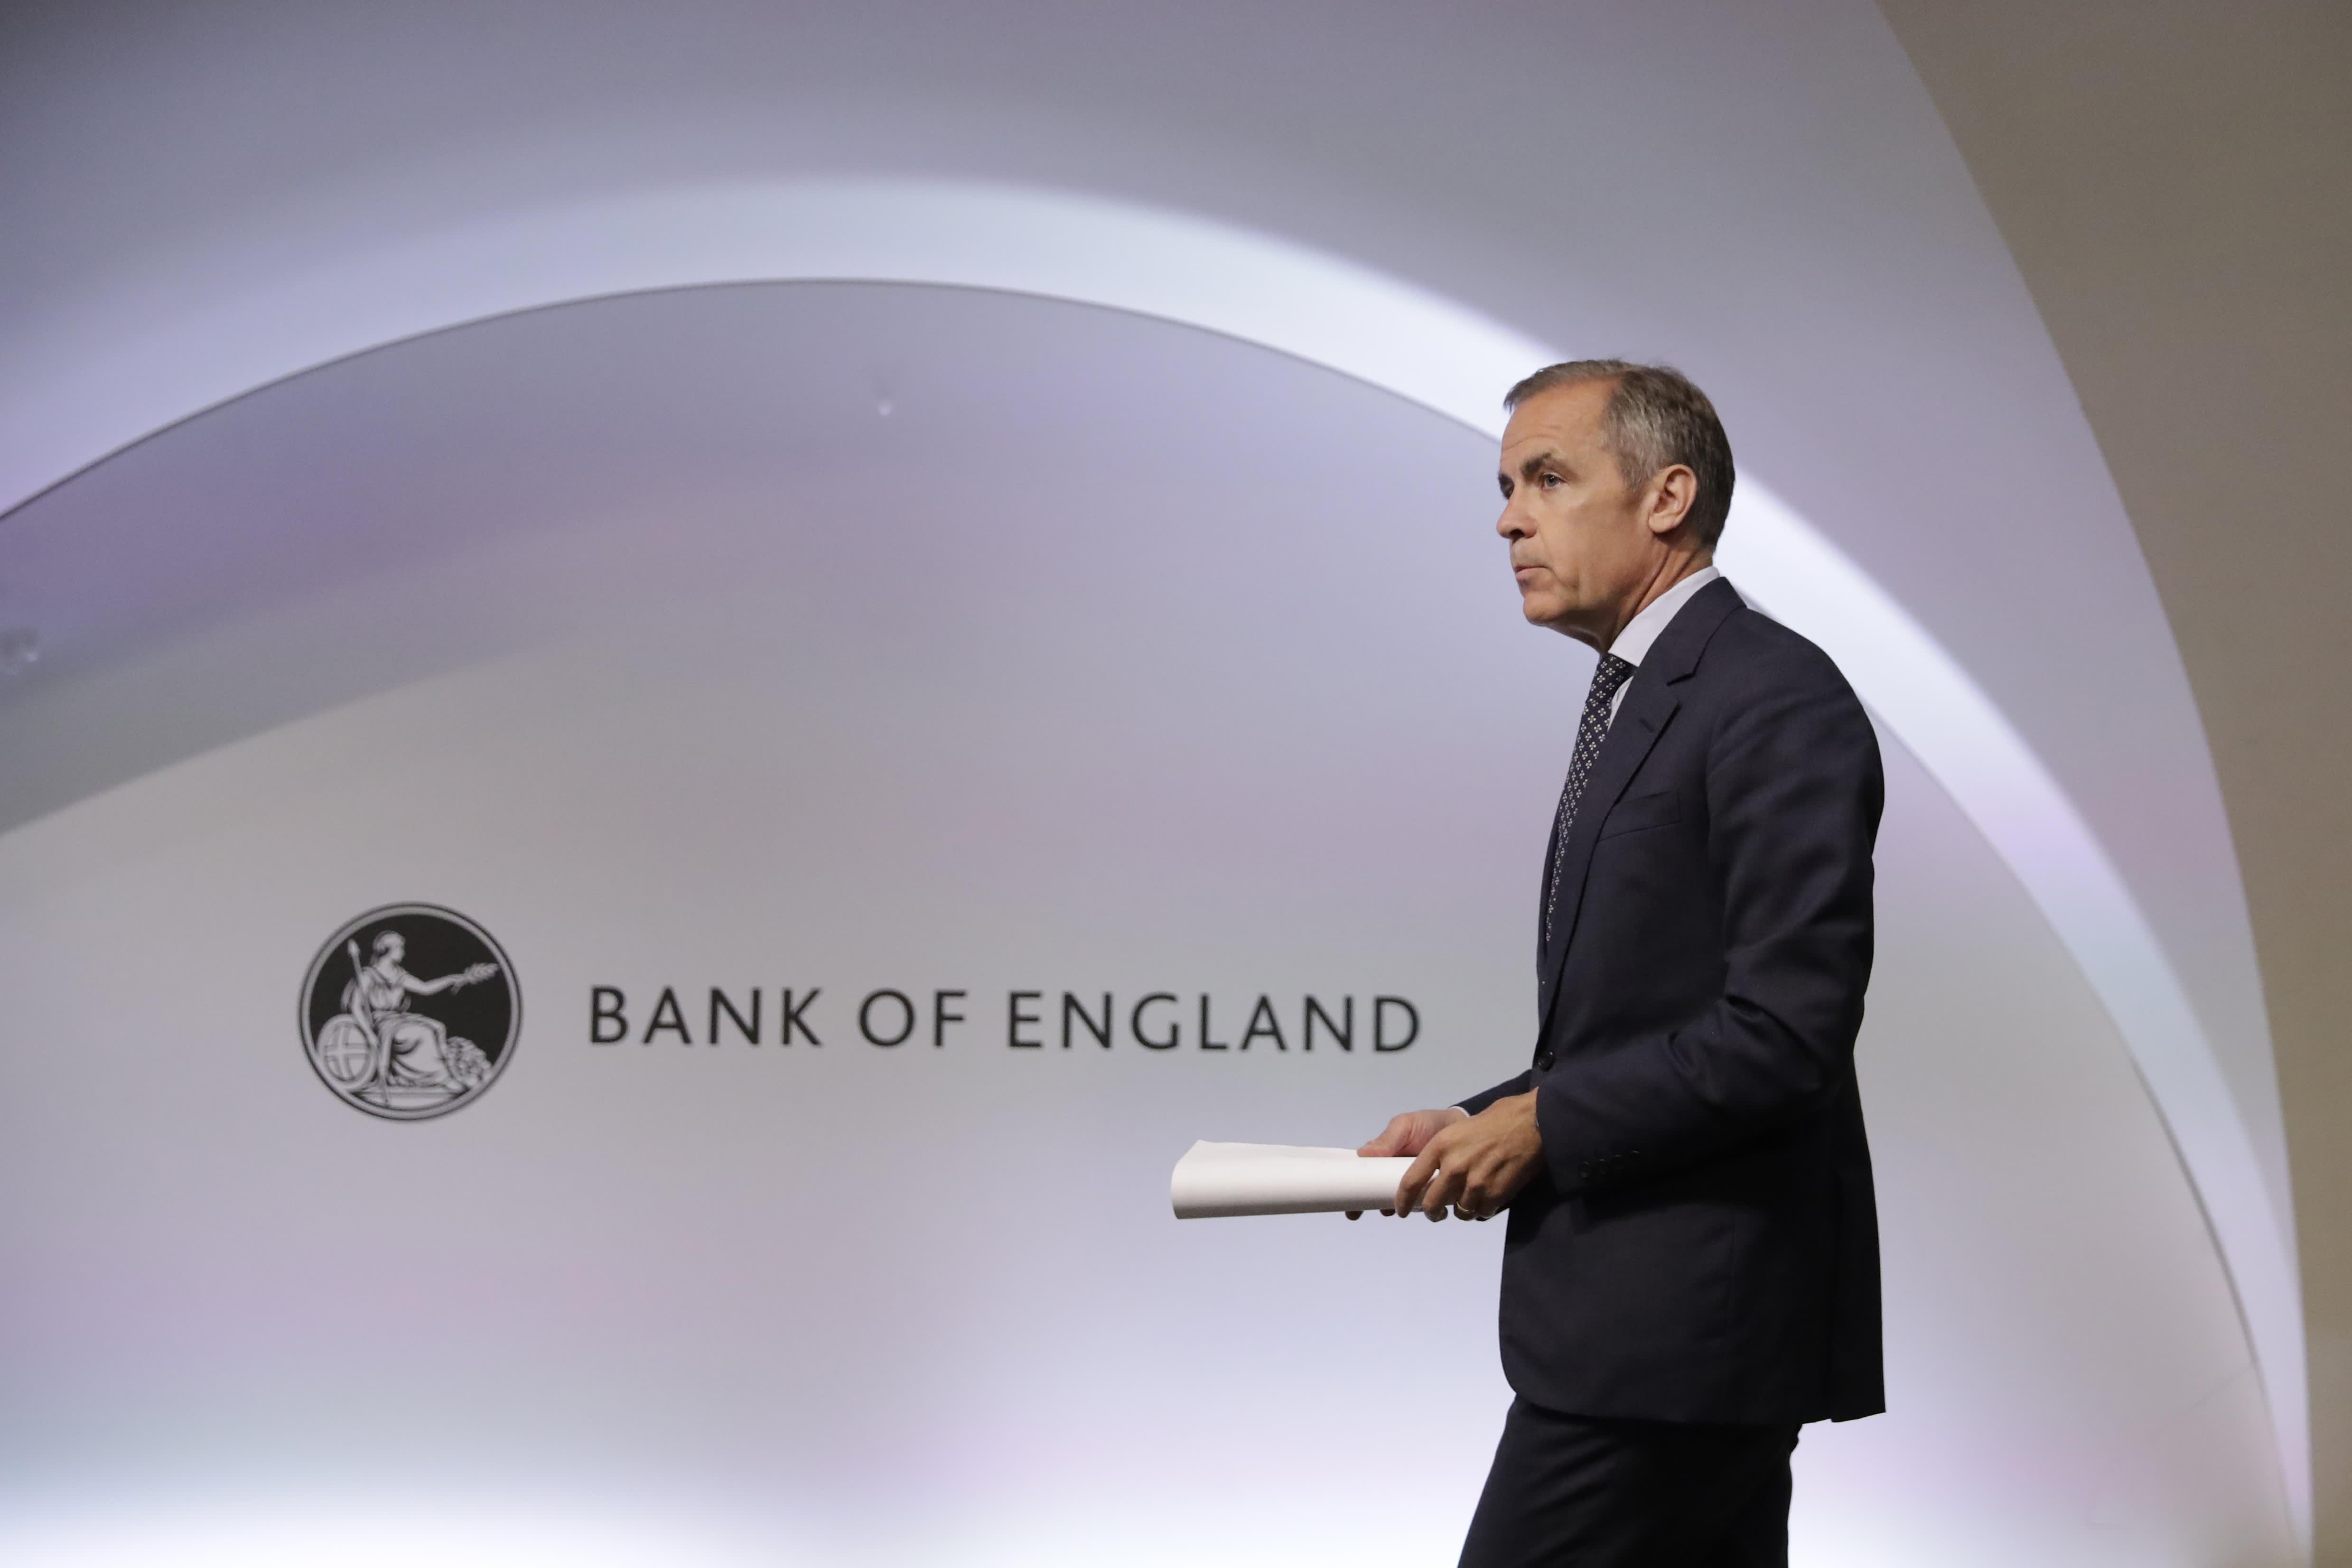 Bank of England's Carney named as Boris Johnson advisor for climate change summit